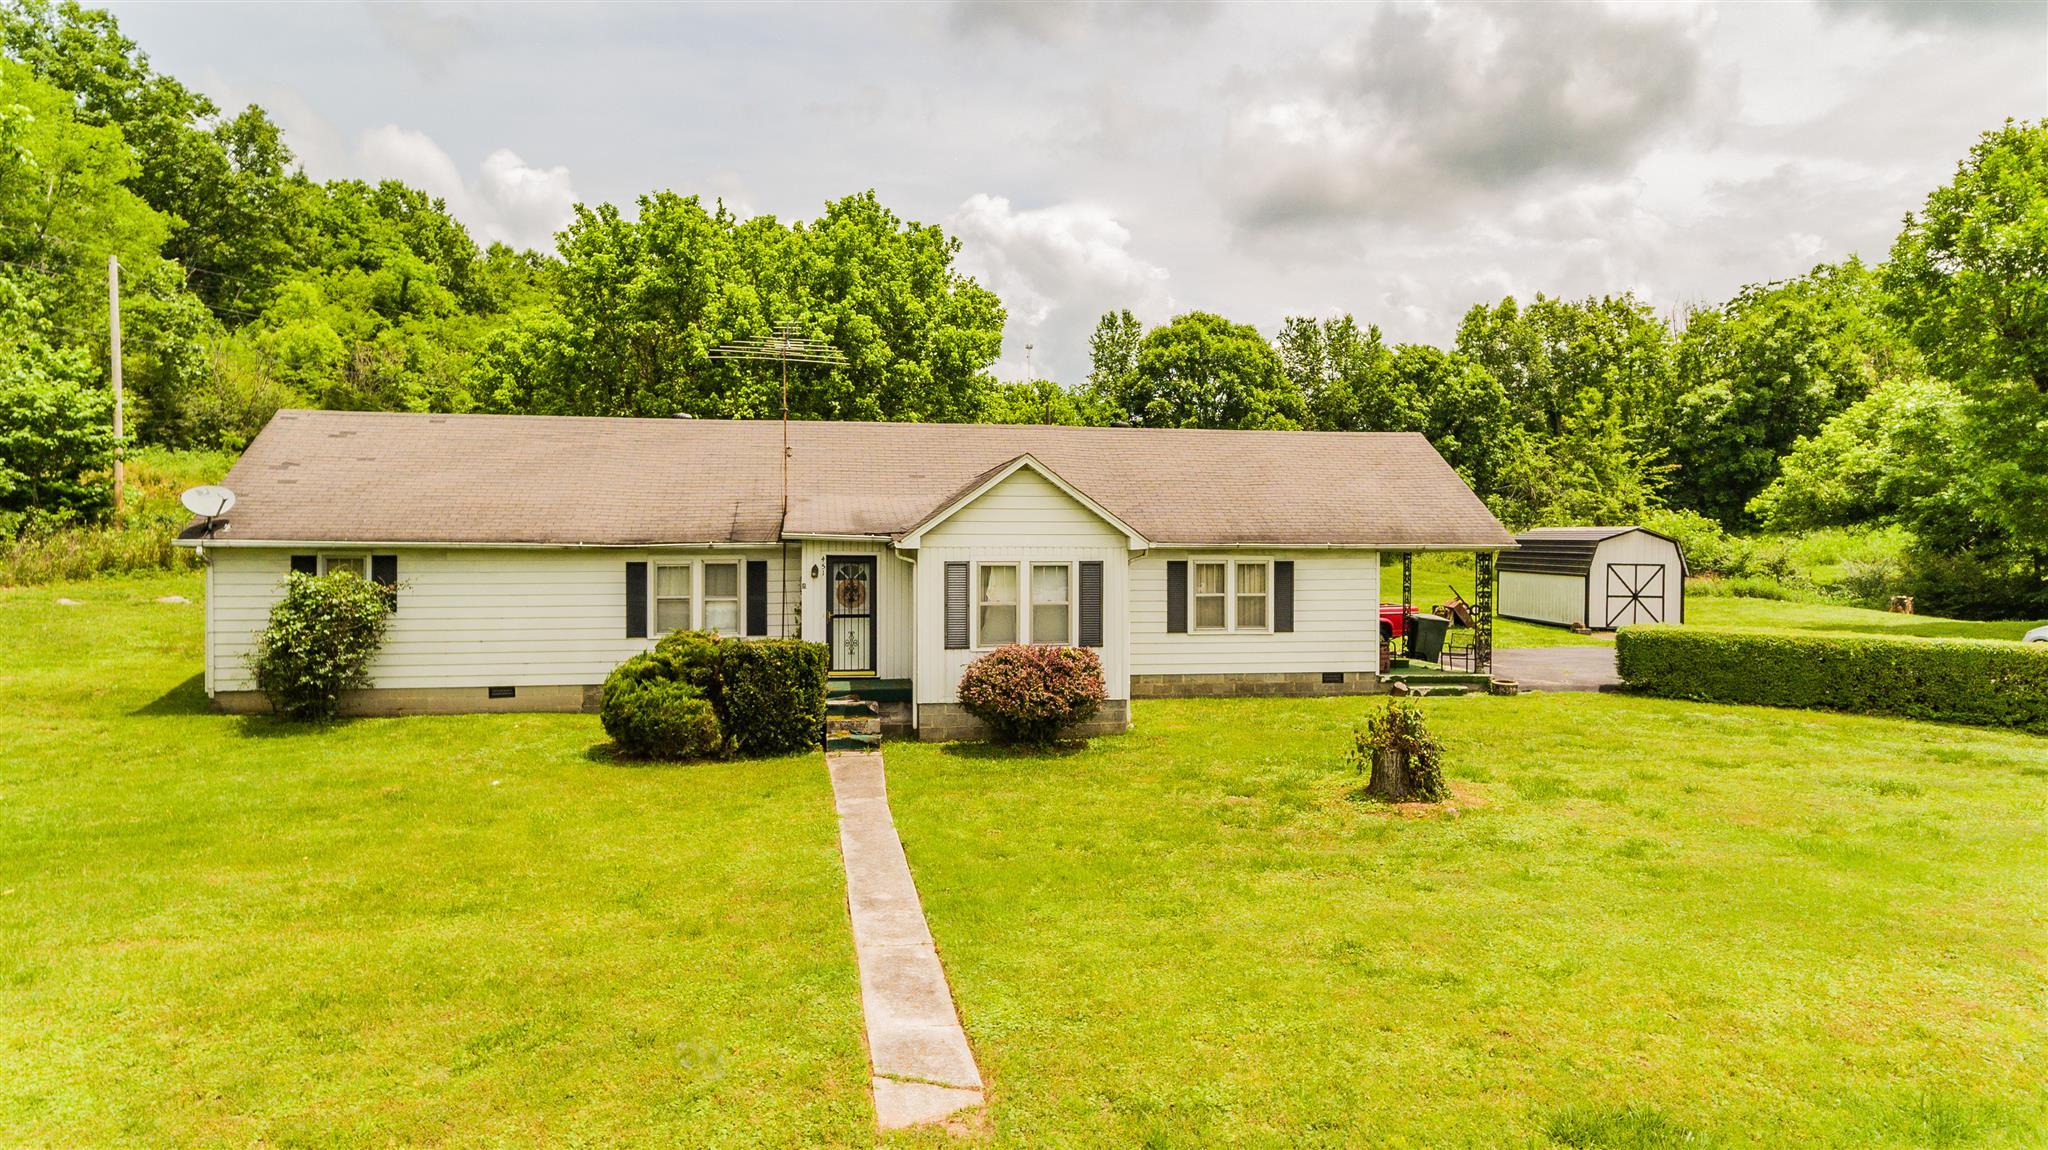 451 Gordonsville Hwy Property Photo - Gordonsville, TN real estate listing